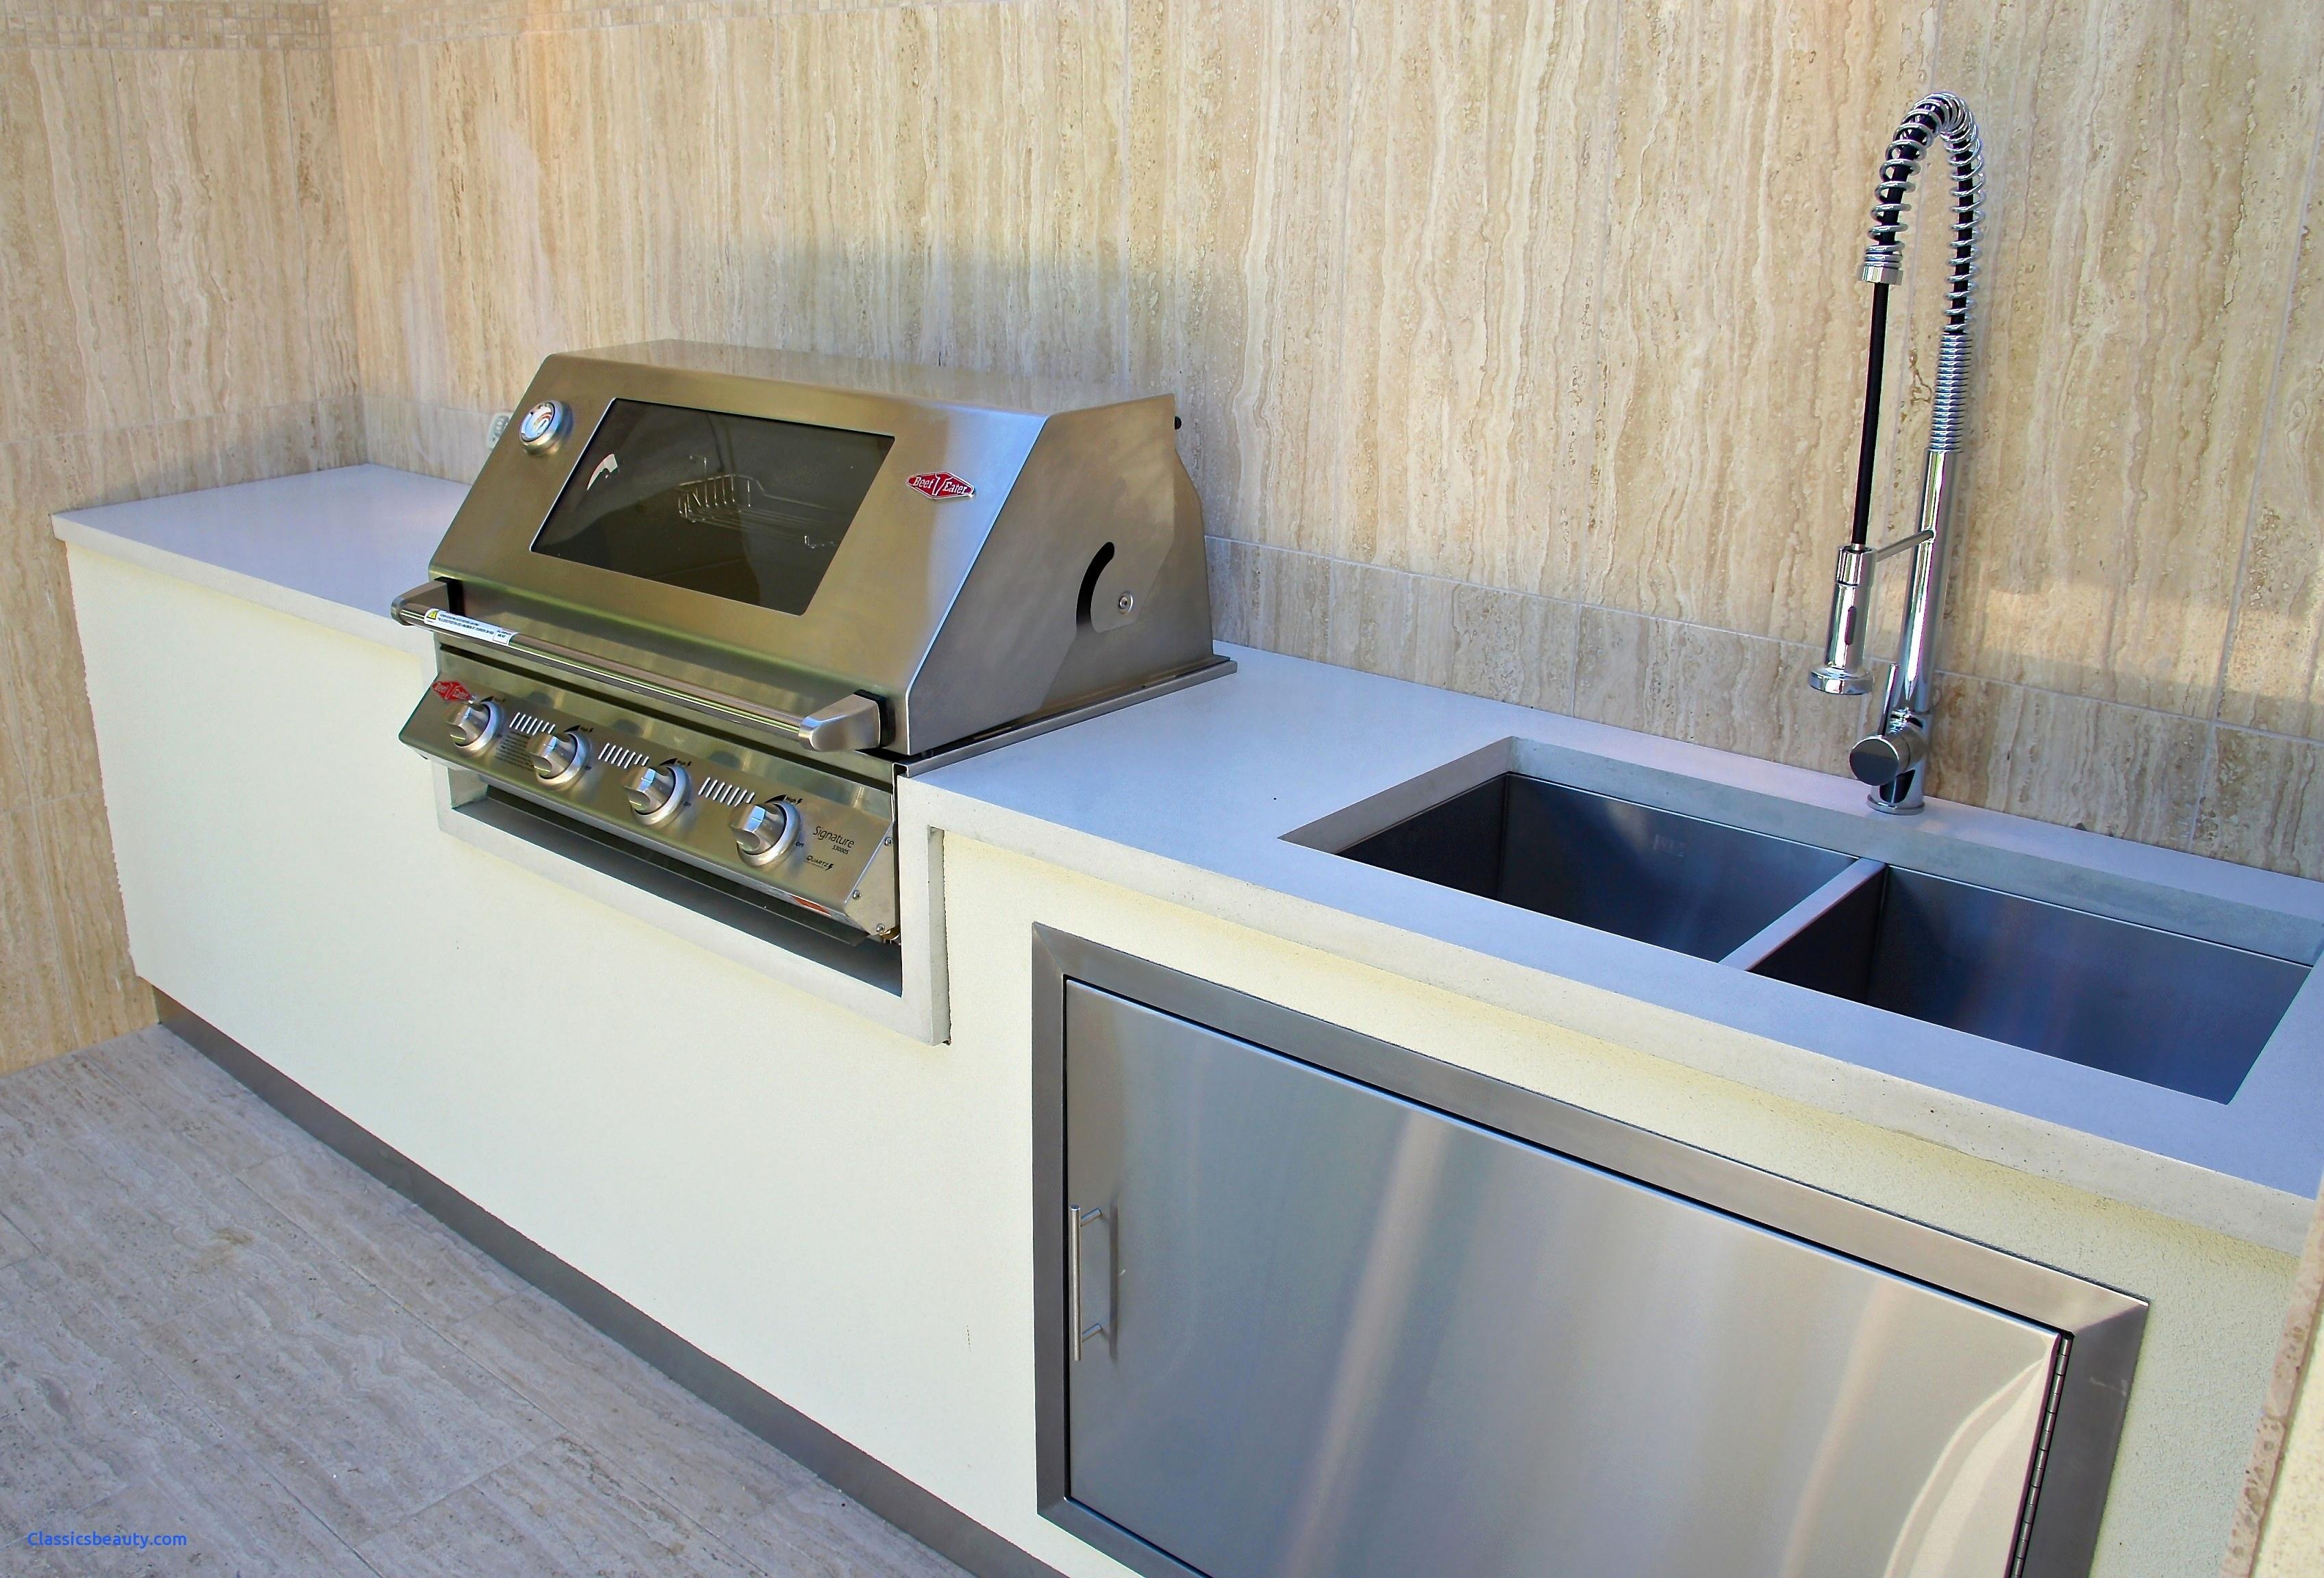 Faucet For Outdoor Sink • Faucet Ideas Site